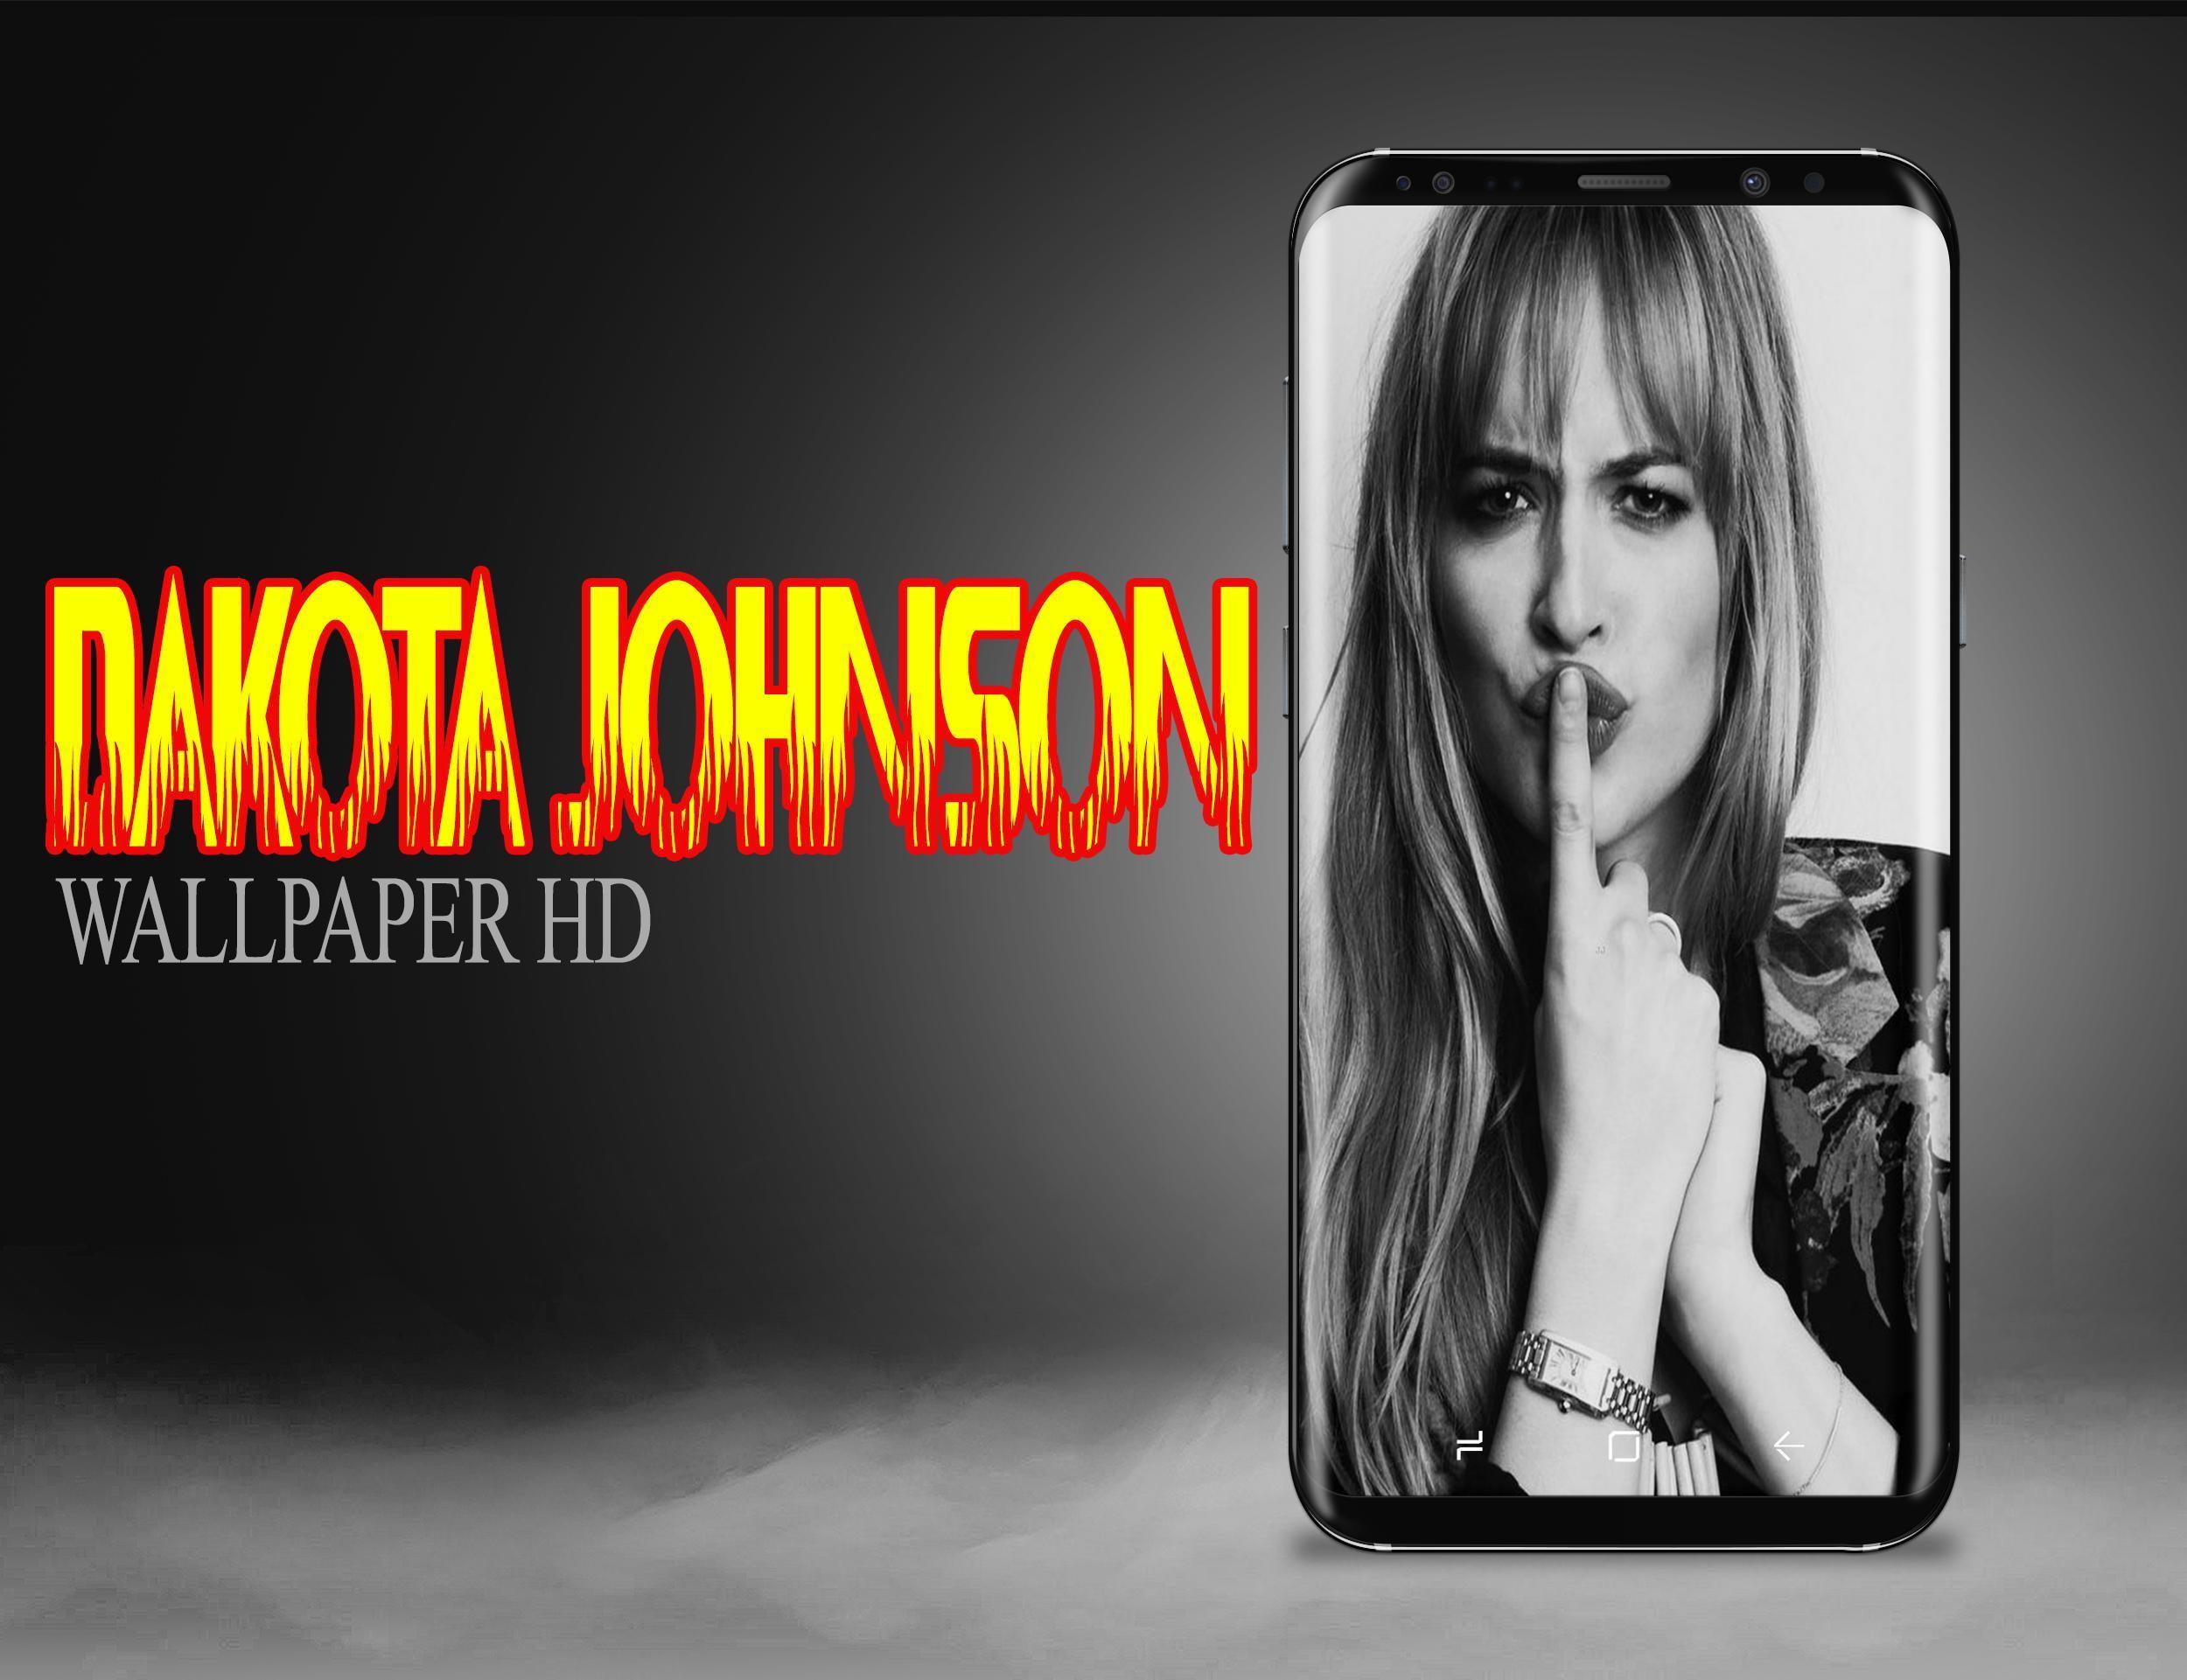 Unduh 100 Wallpaper Hd Johnson  Paling Baru